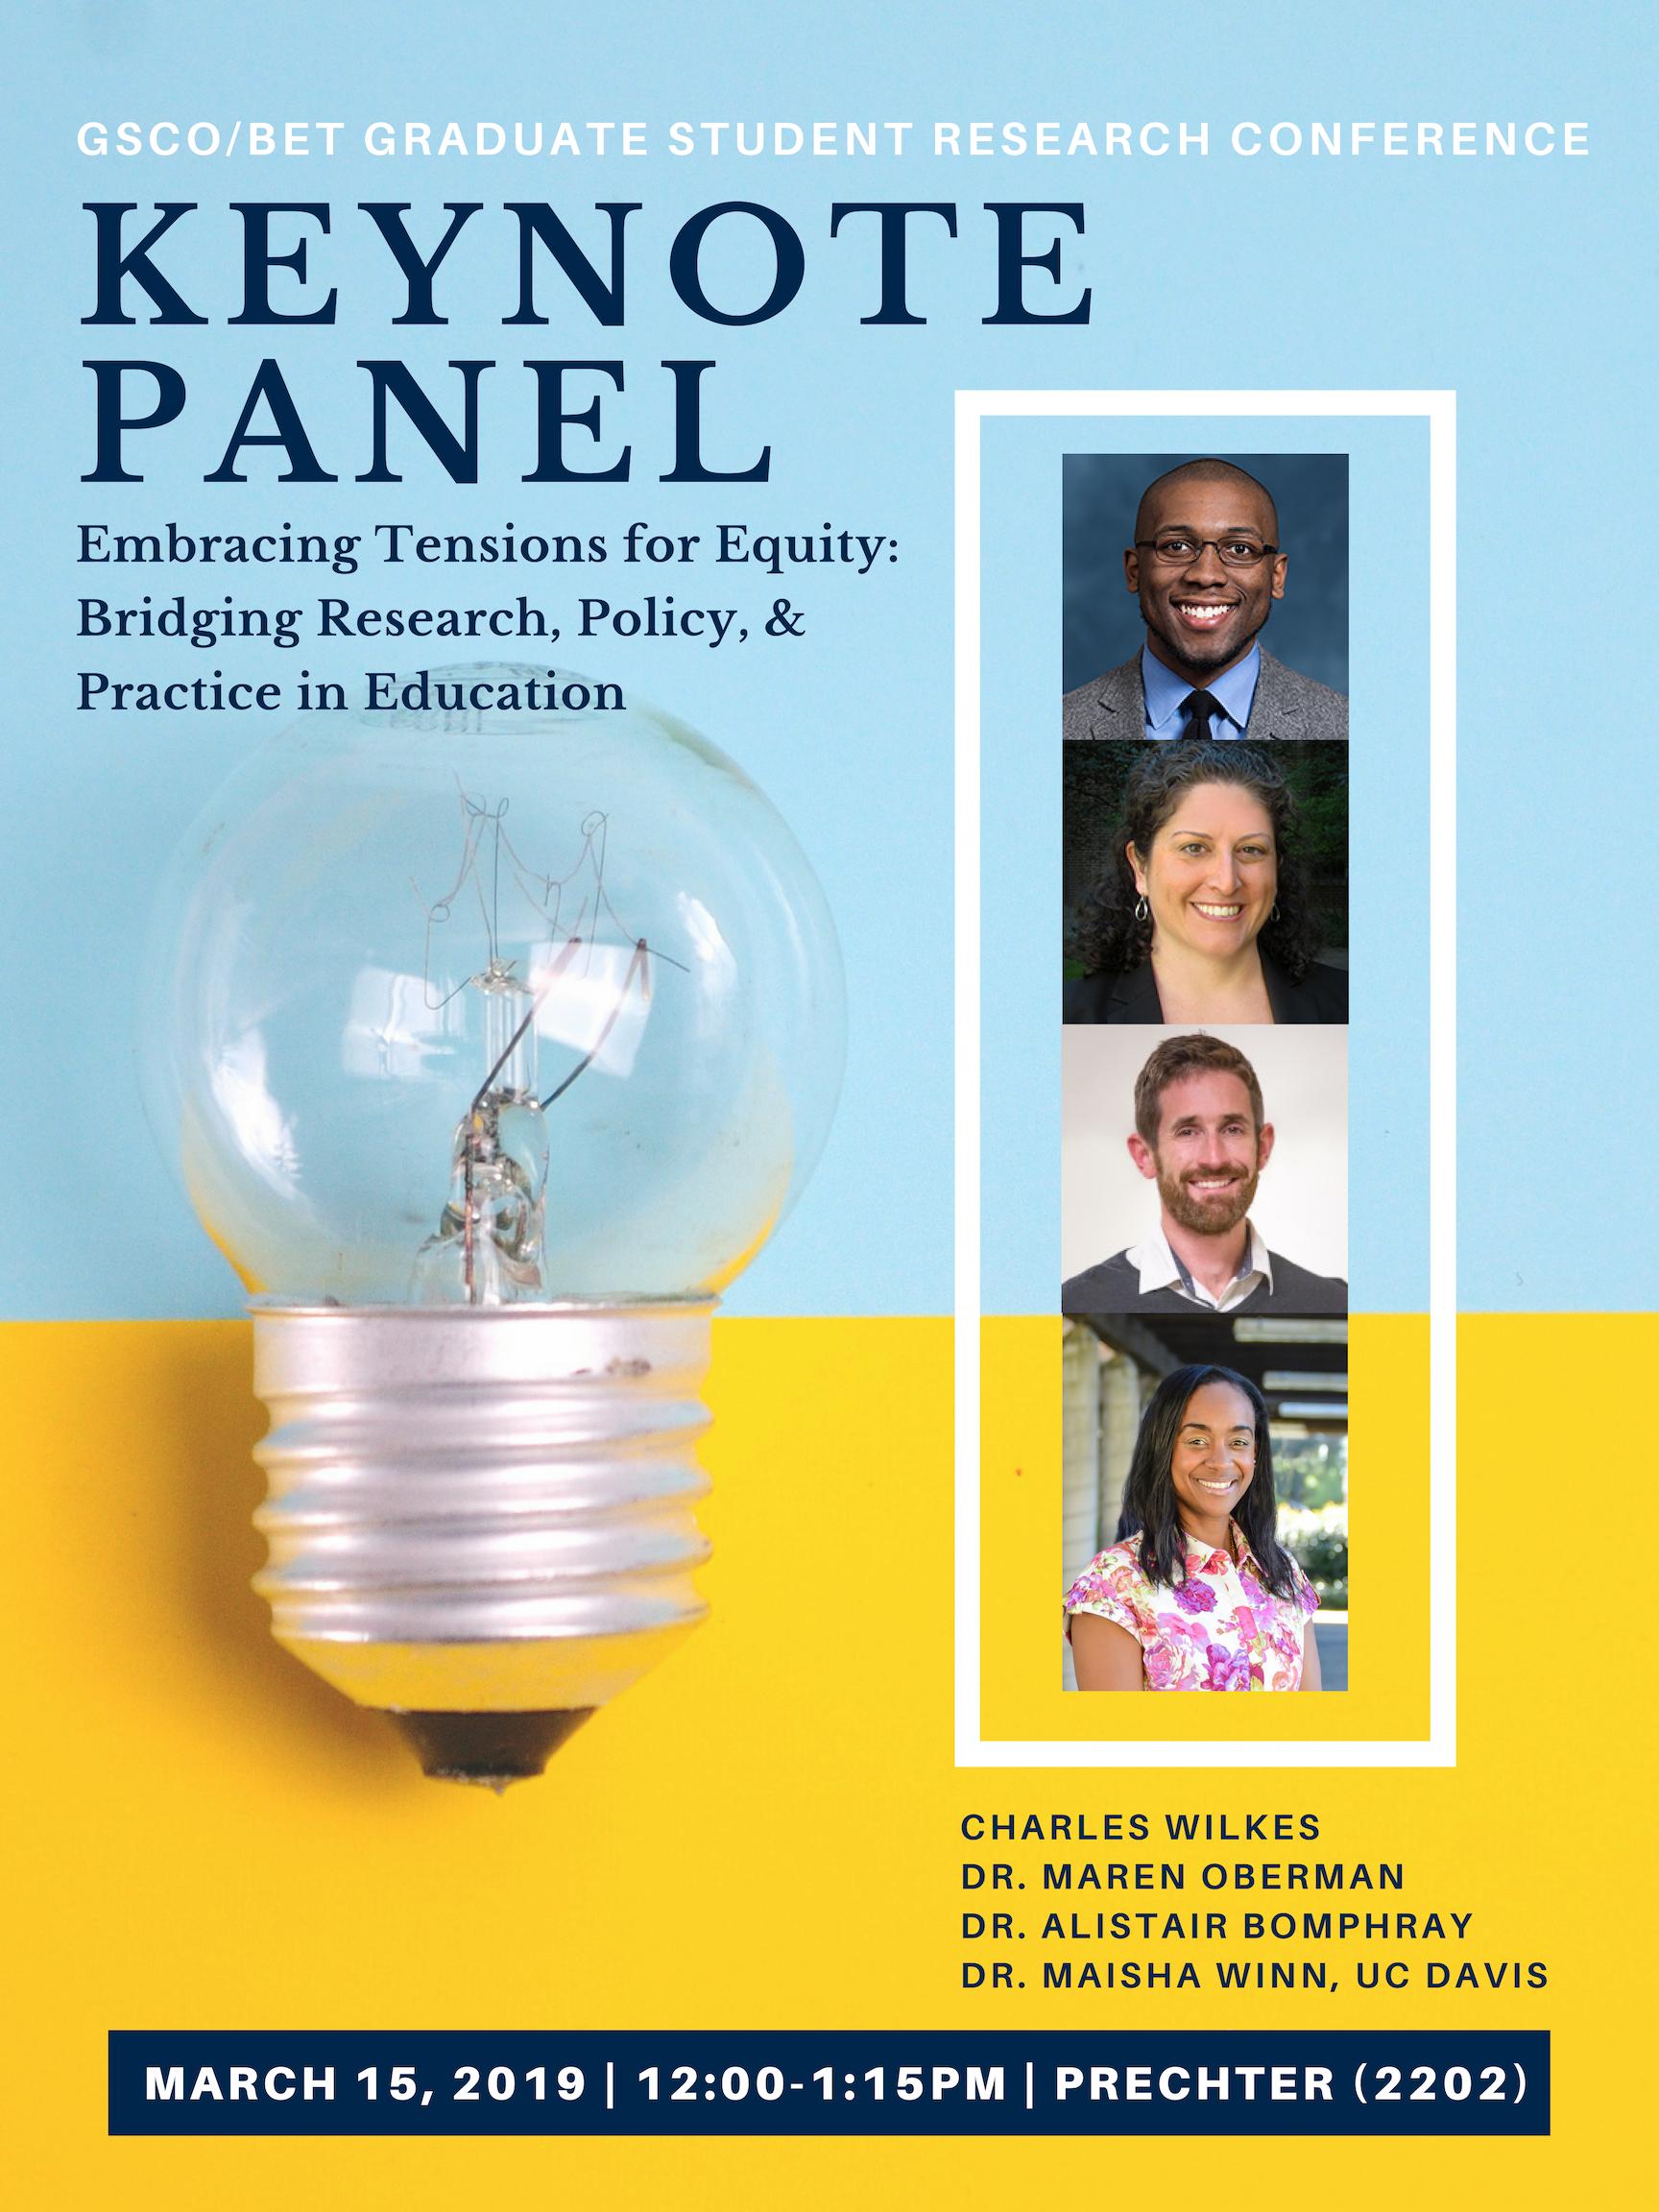 GSRC Keynote Panel